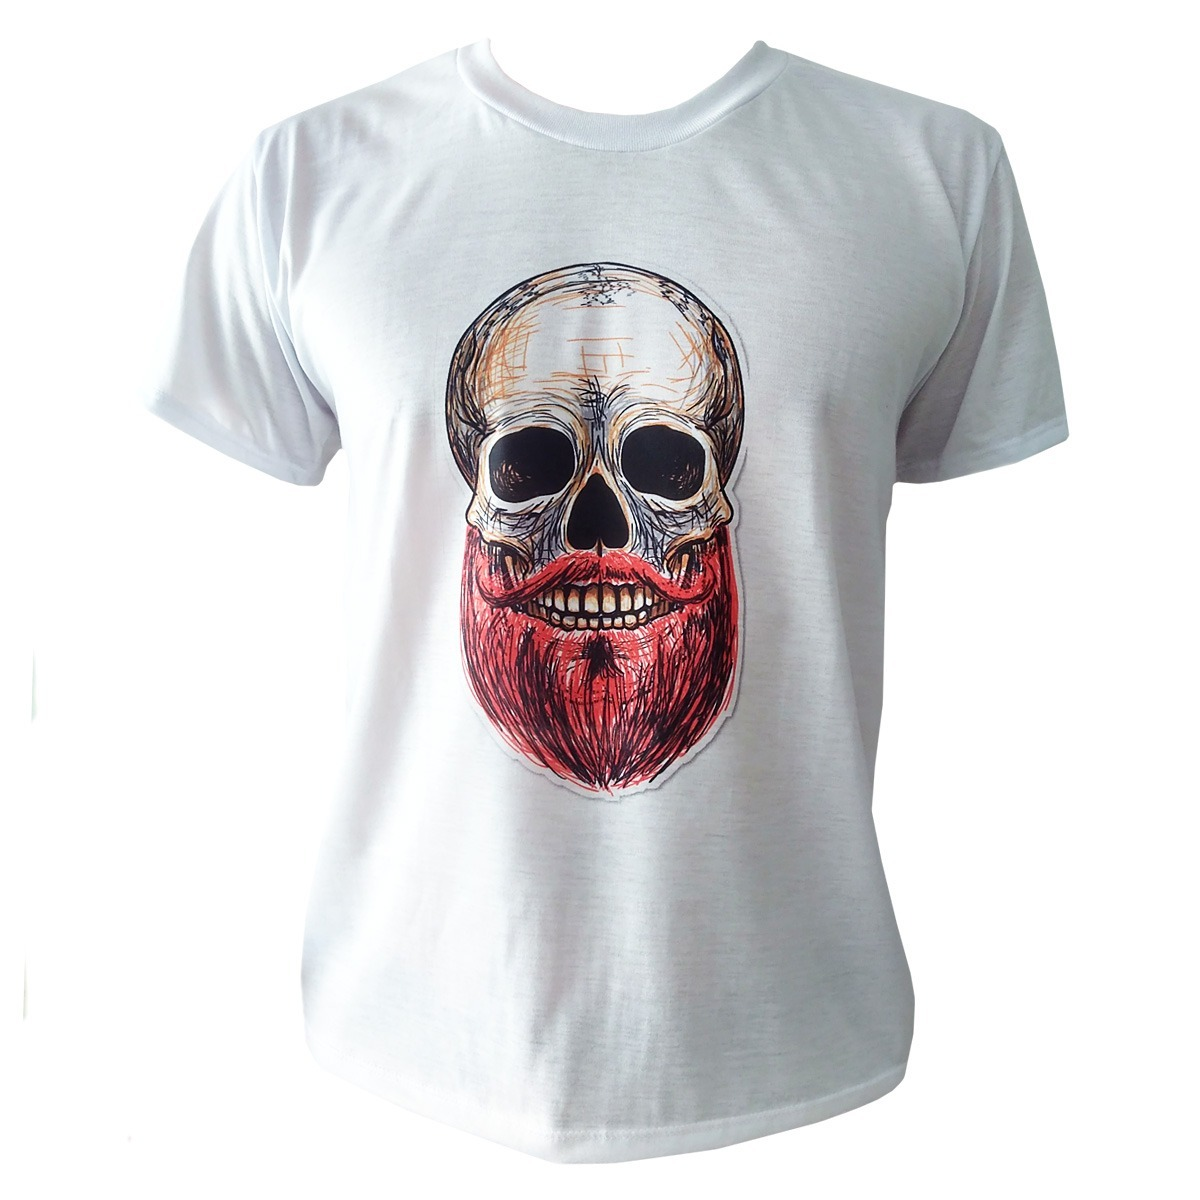 d54db9081 camiseta caveira skull masculina vintage camisa branca. Carregando zoom.